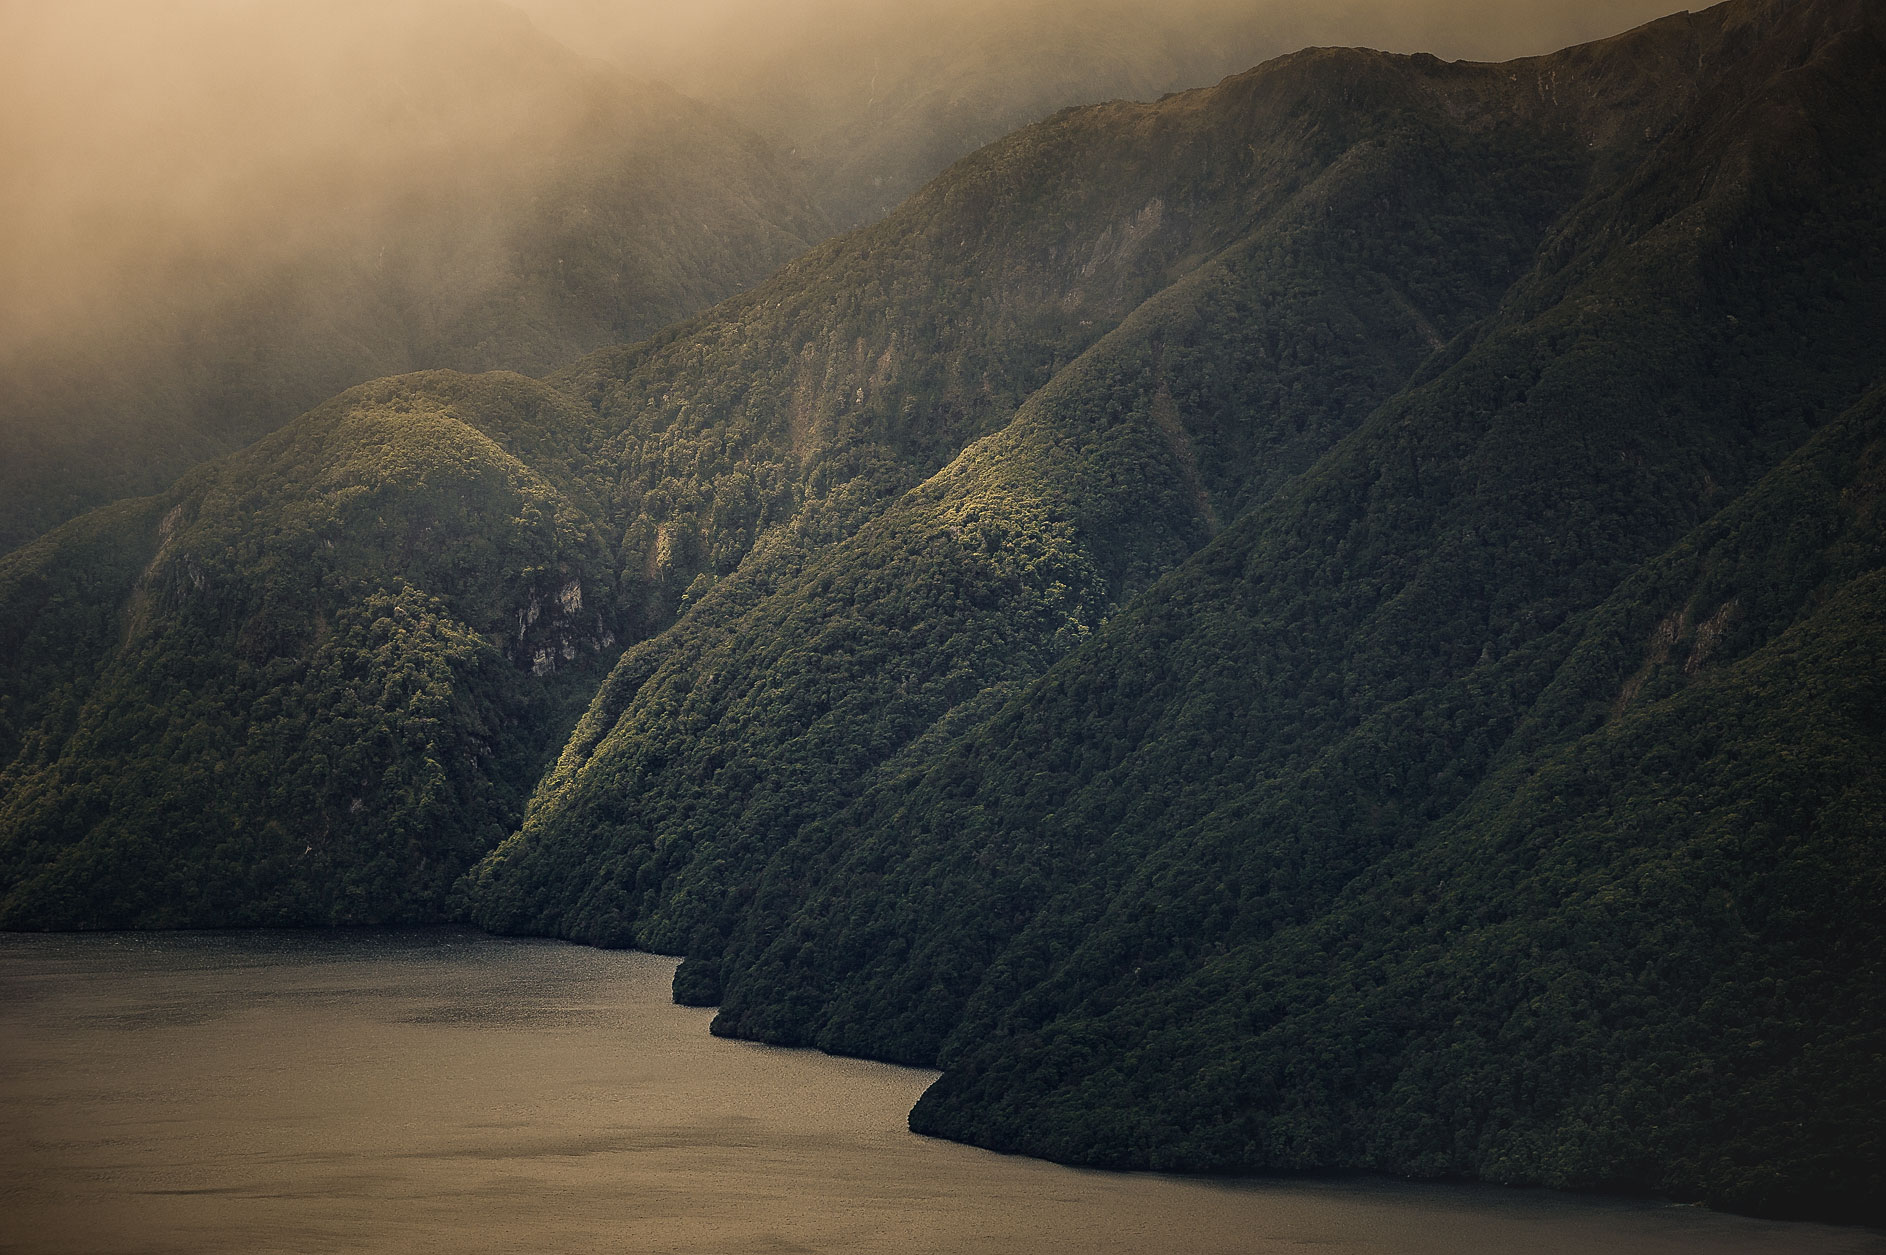 MBP_NZ_19.jpg